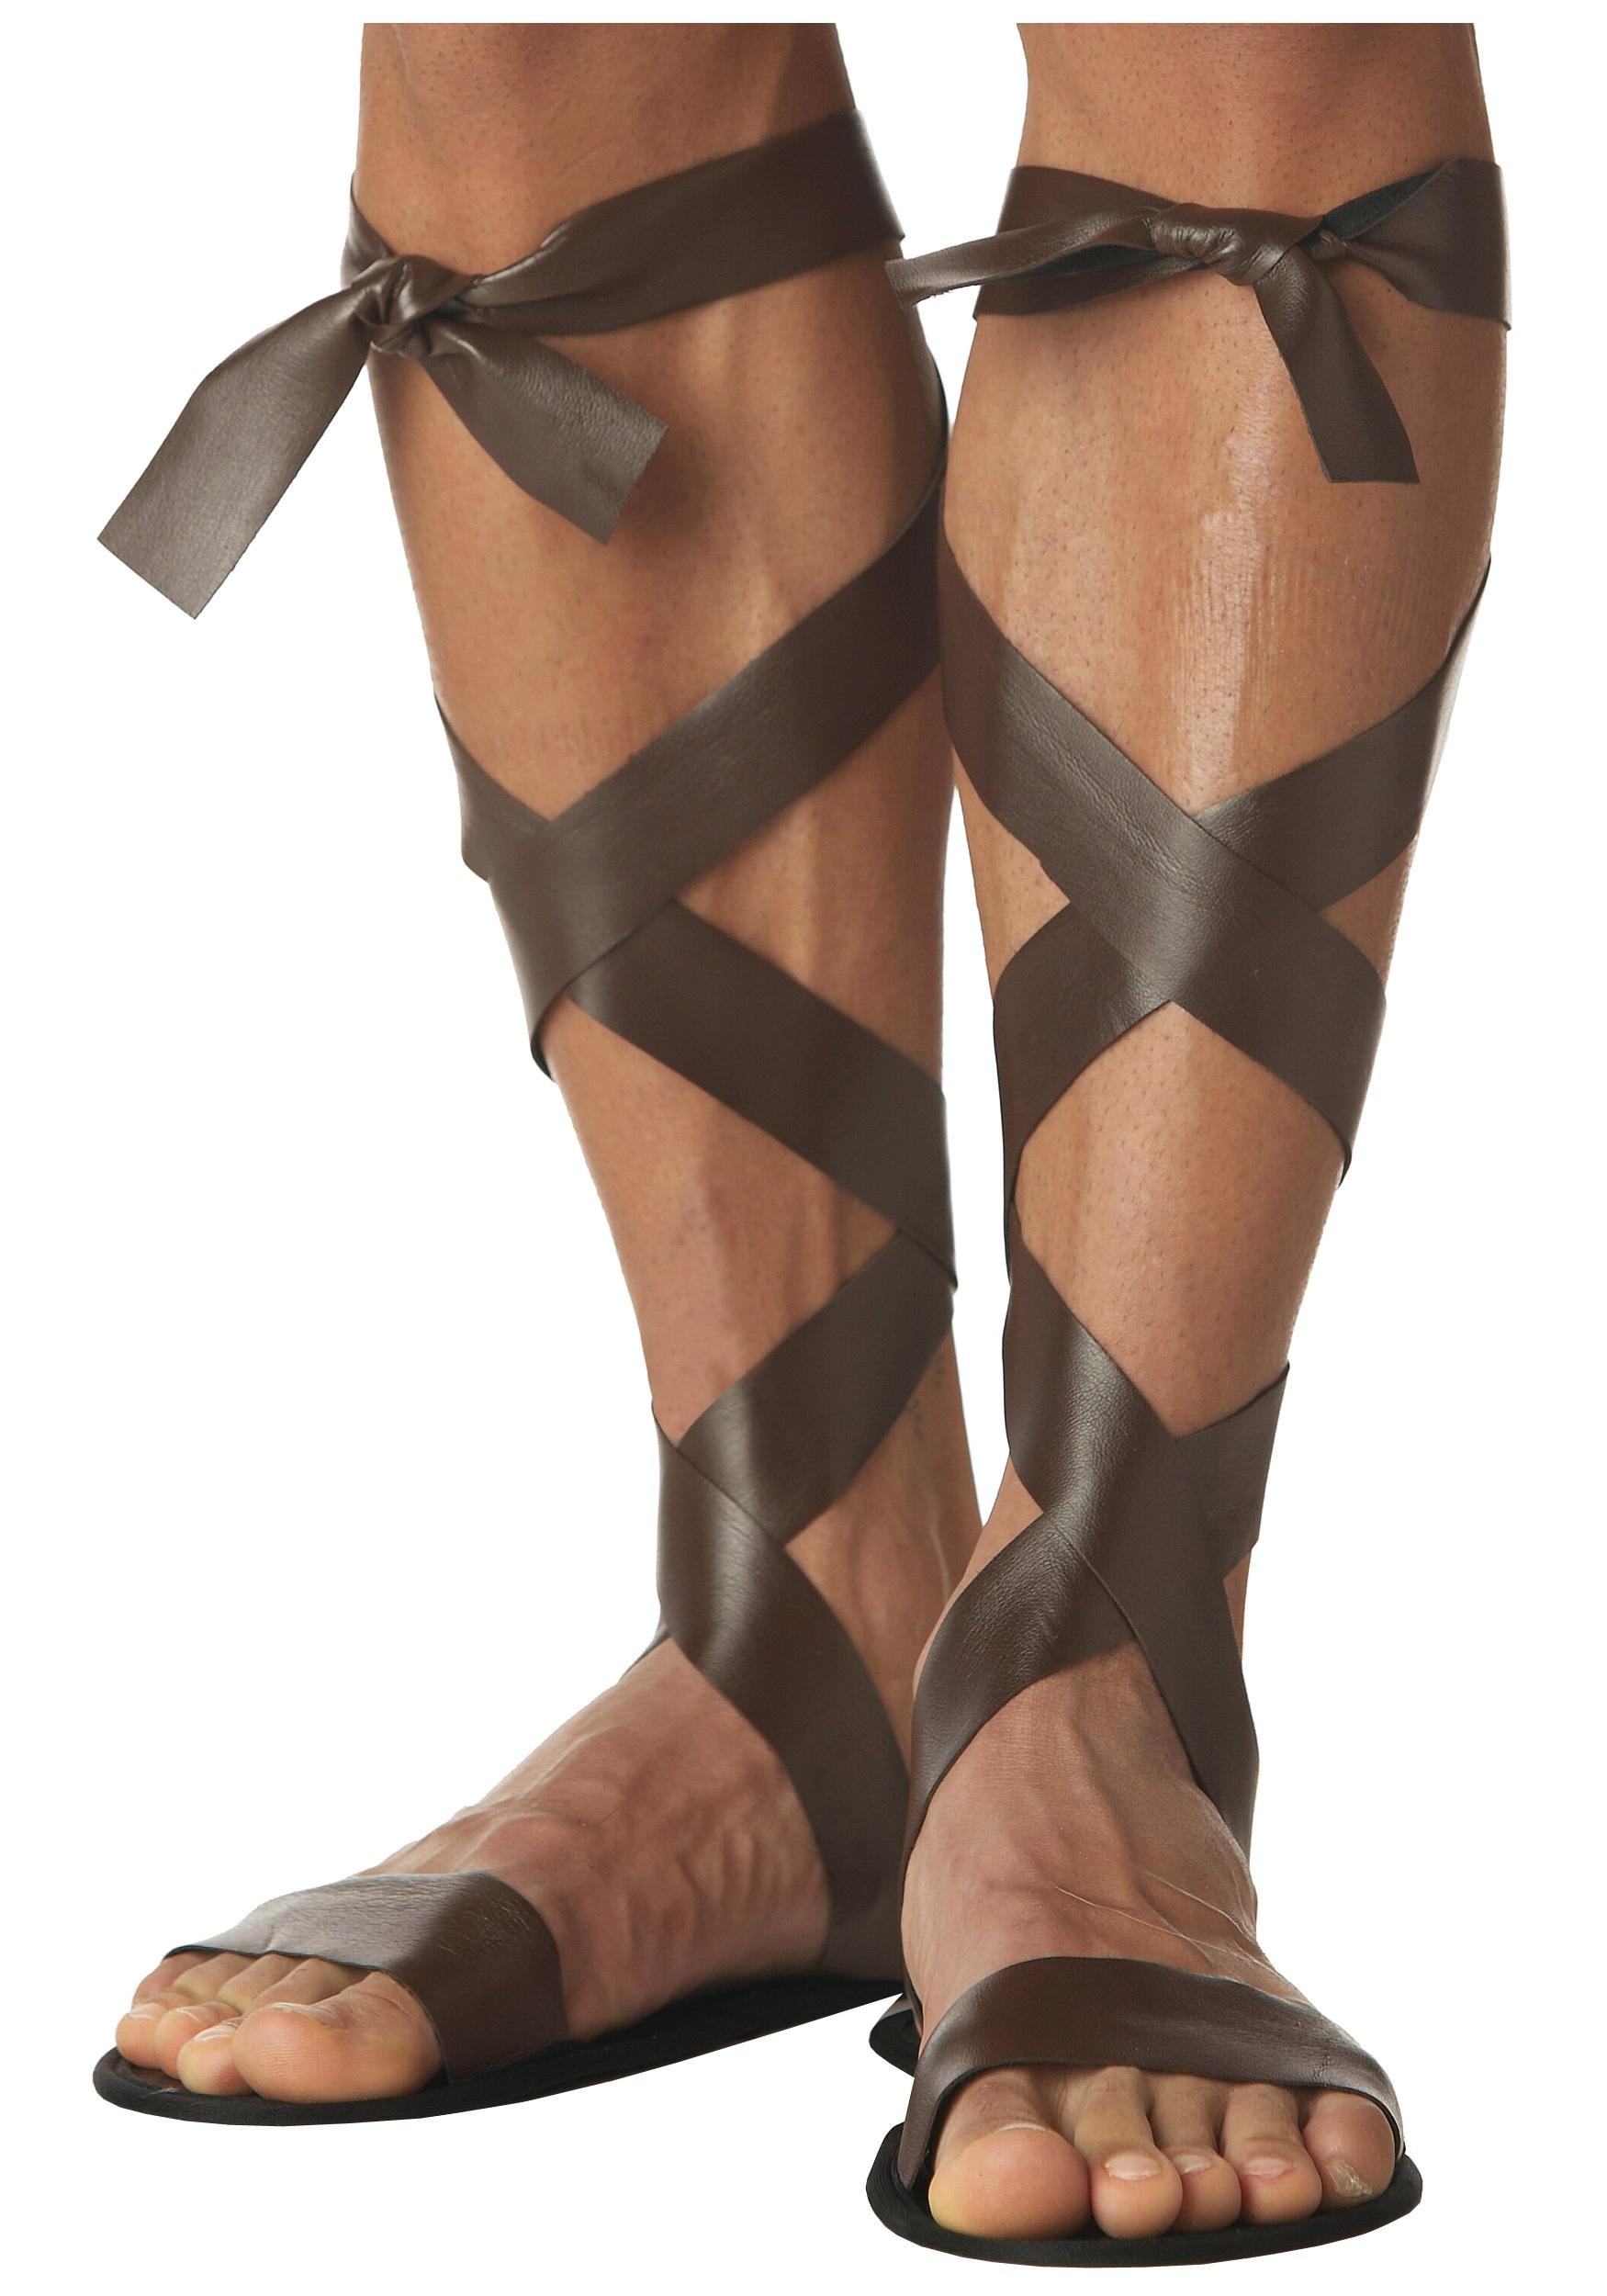 Ancient Warrior Sandals Roman Soldier Costume Accessories